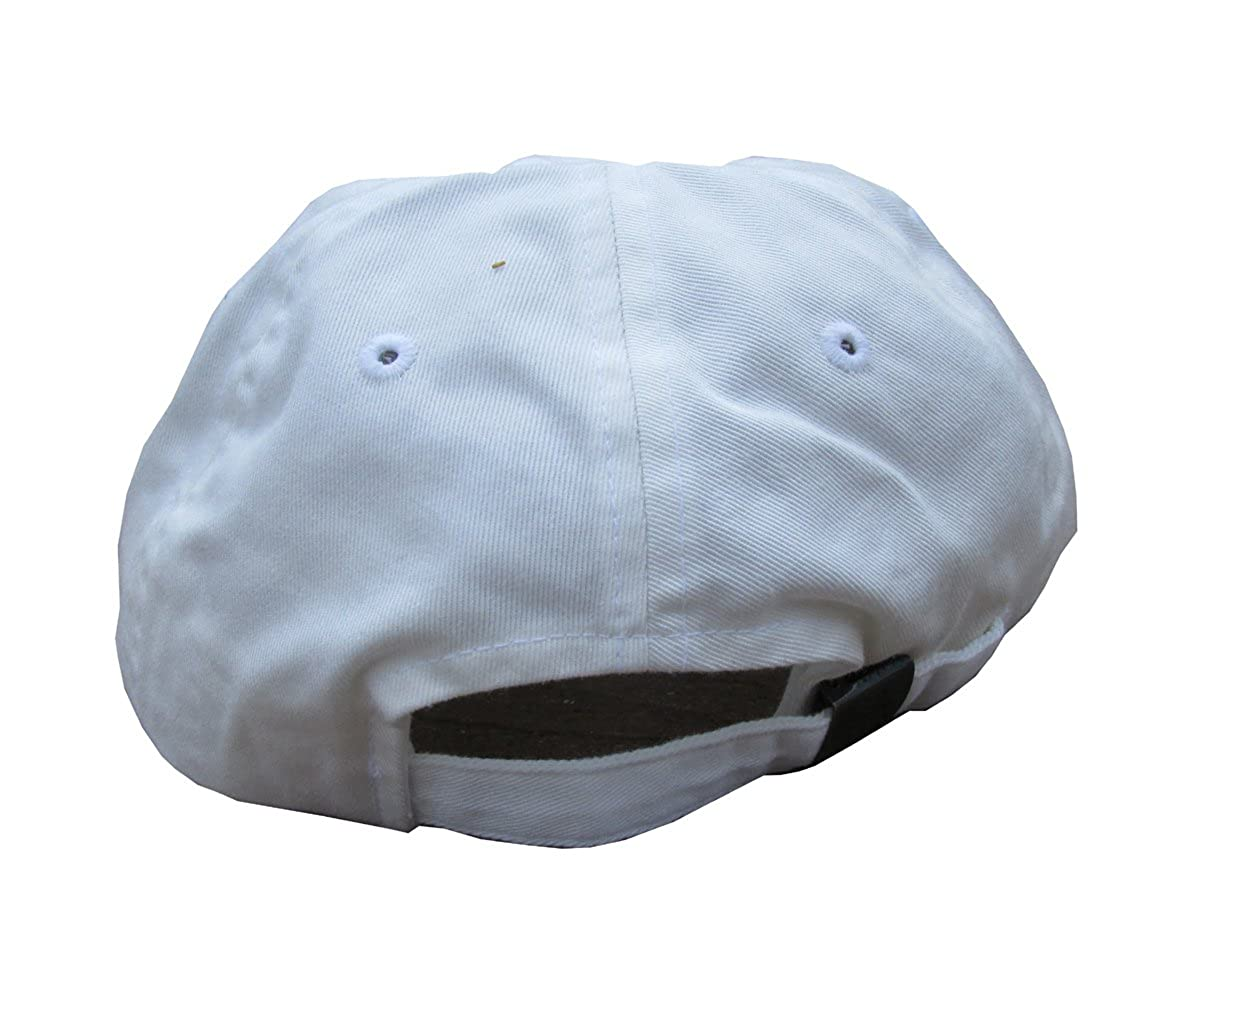 df58cad77c2 Rob sTees Panda Emoji Meme White Unstructured Twill Cotton Low Profile  Yeezus Dad Hat Cap at Amazon Men s Clothing store